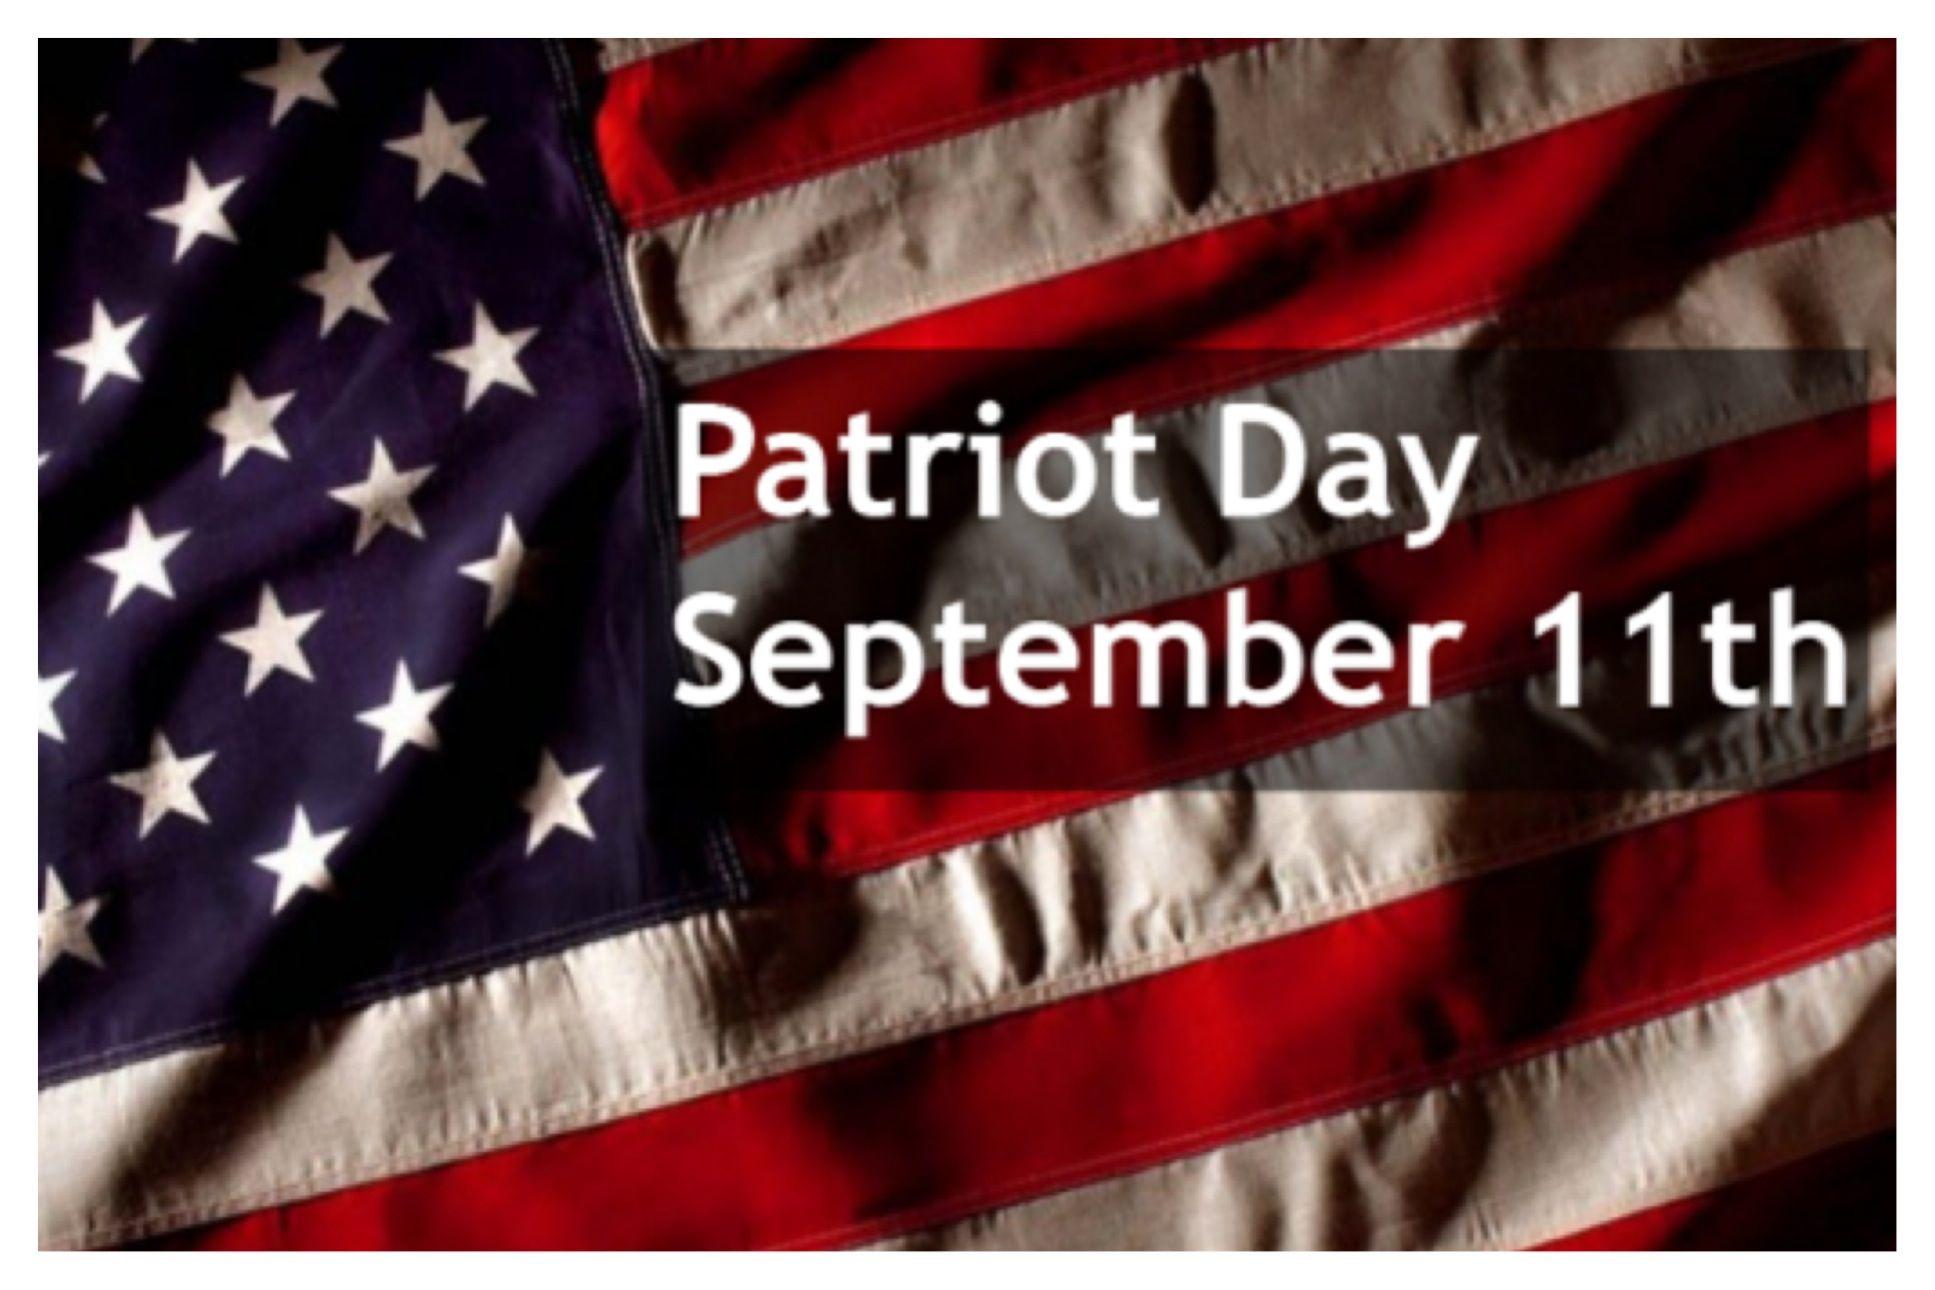 Patriot Day Patriots day, September 11, Canada vacation